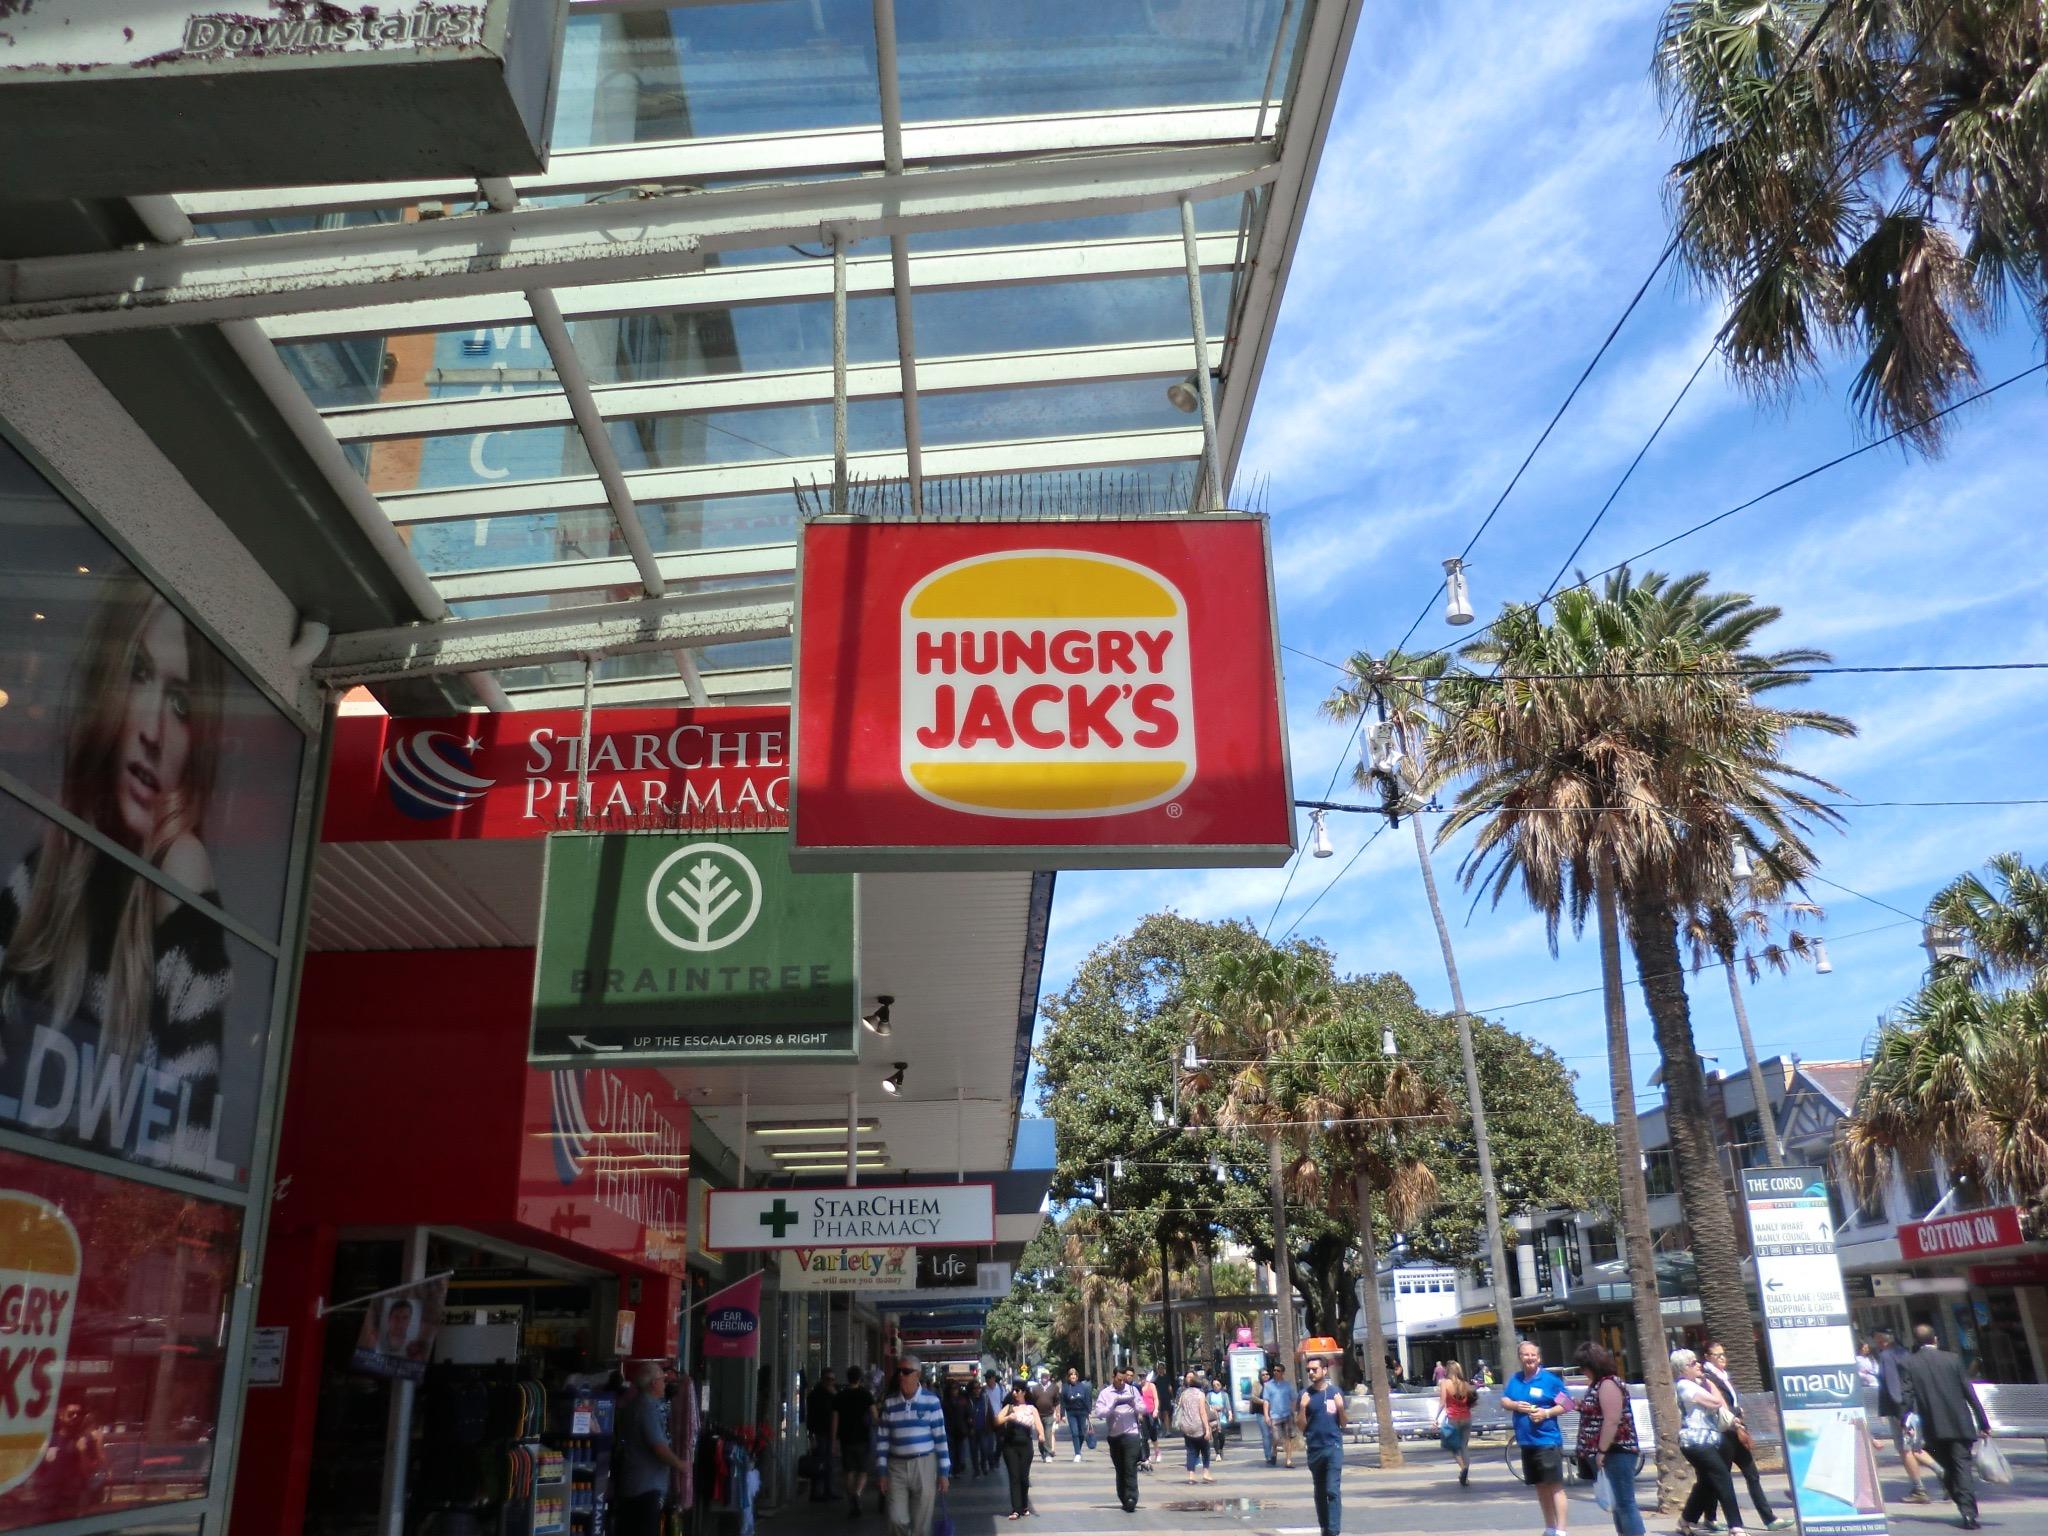 Australia's version of Burger King